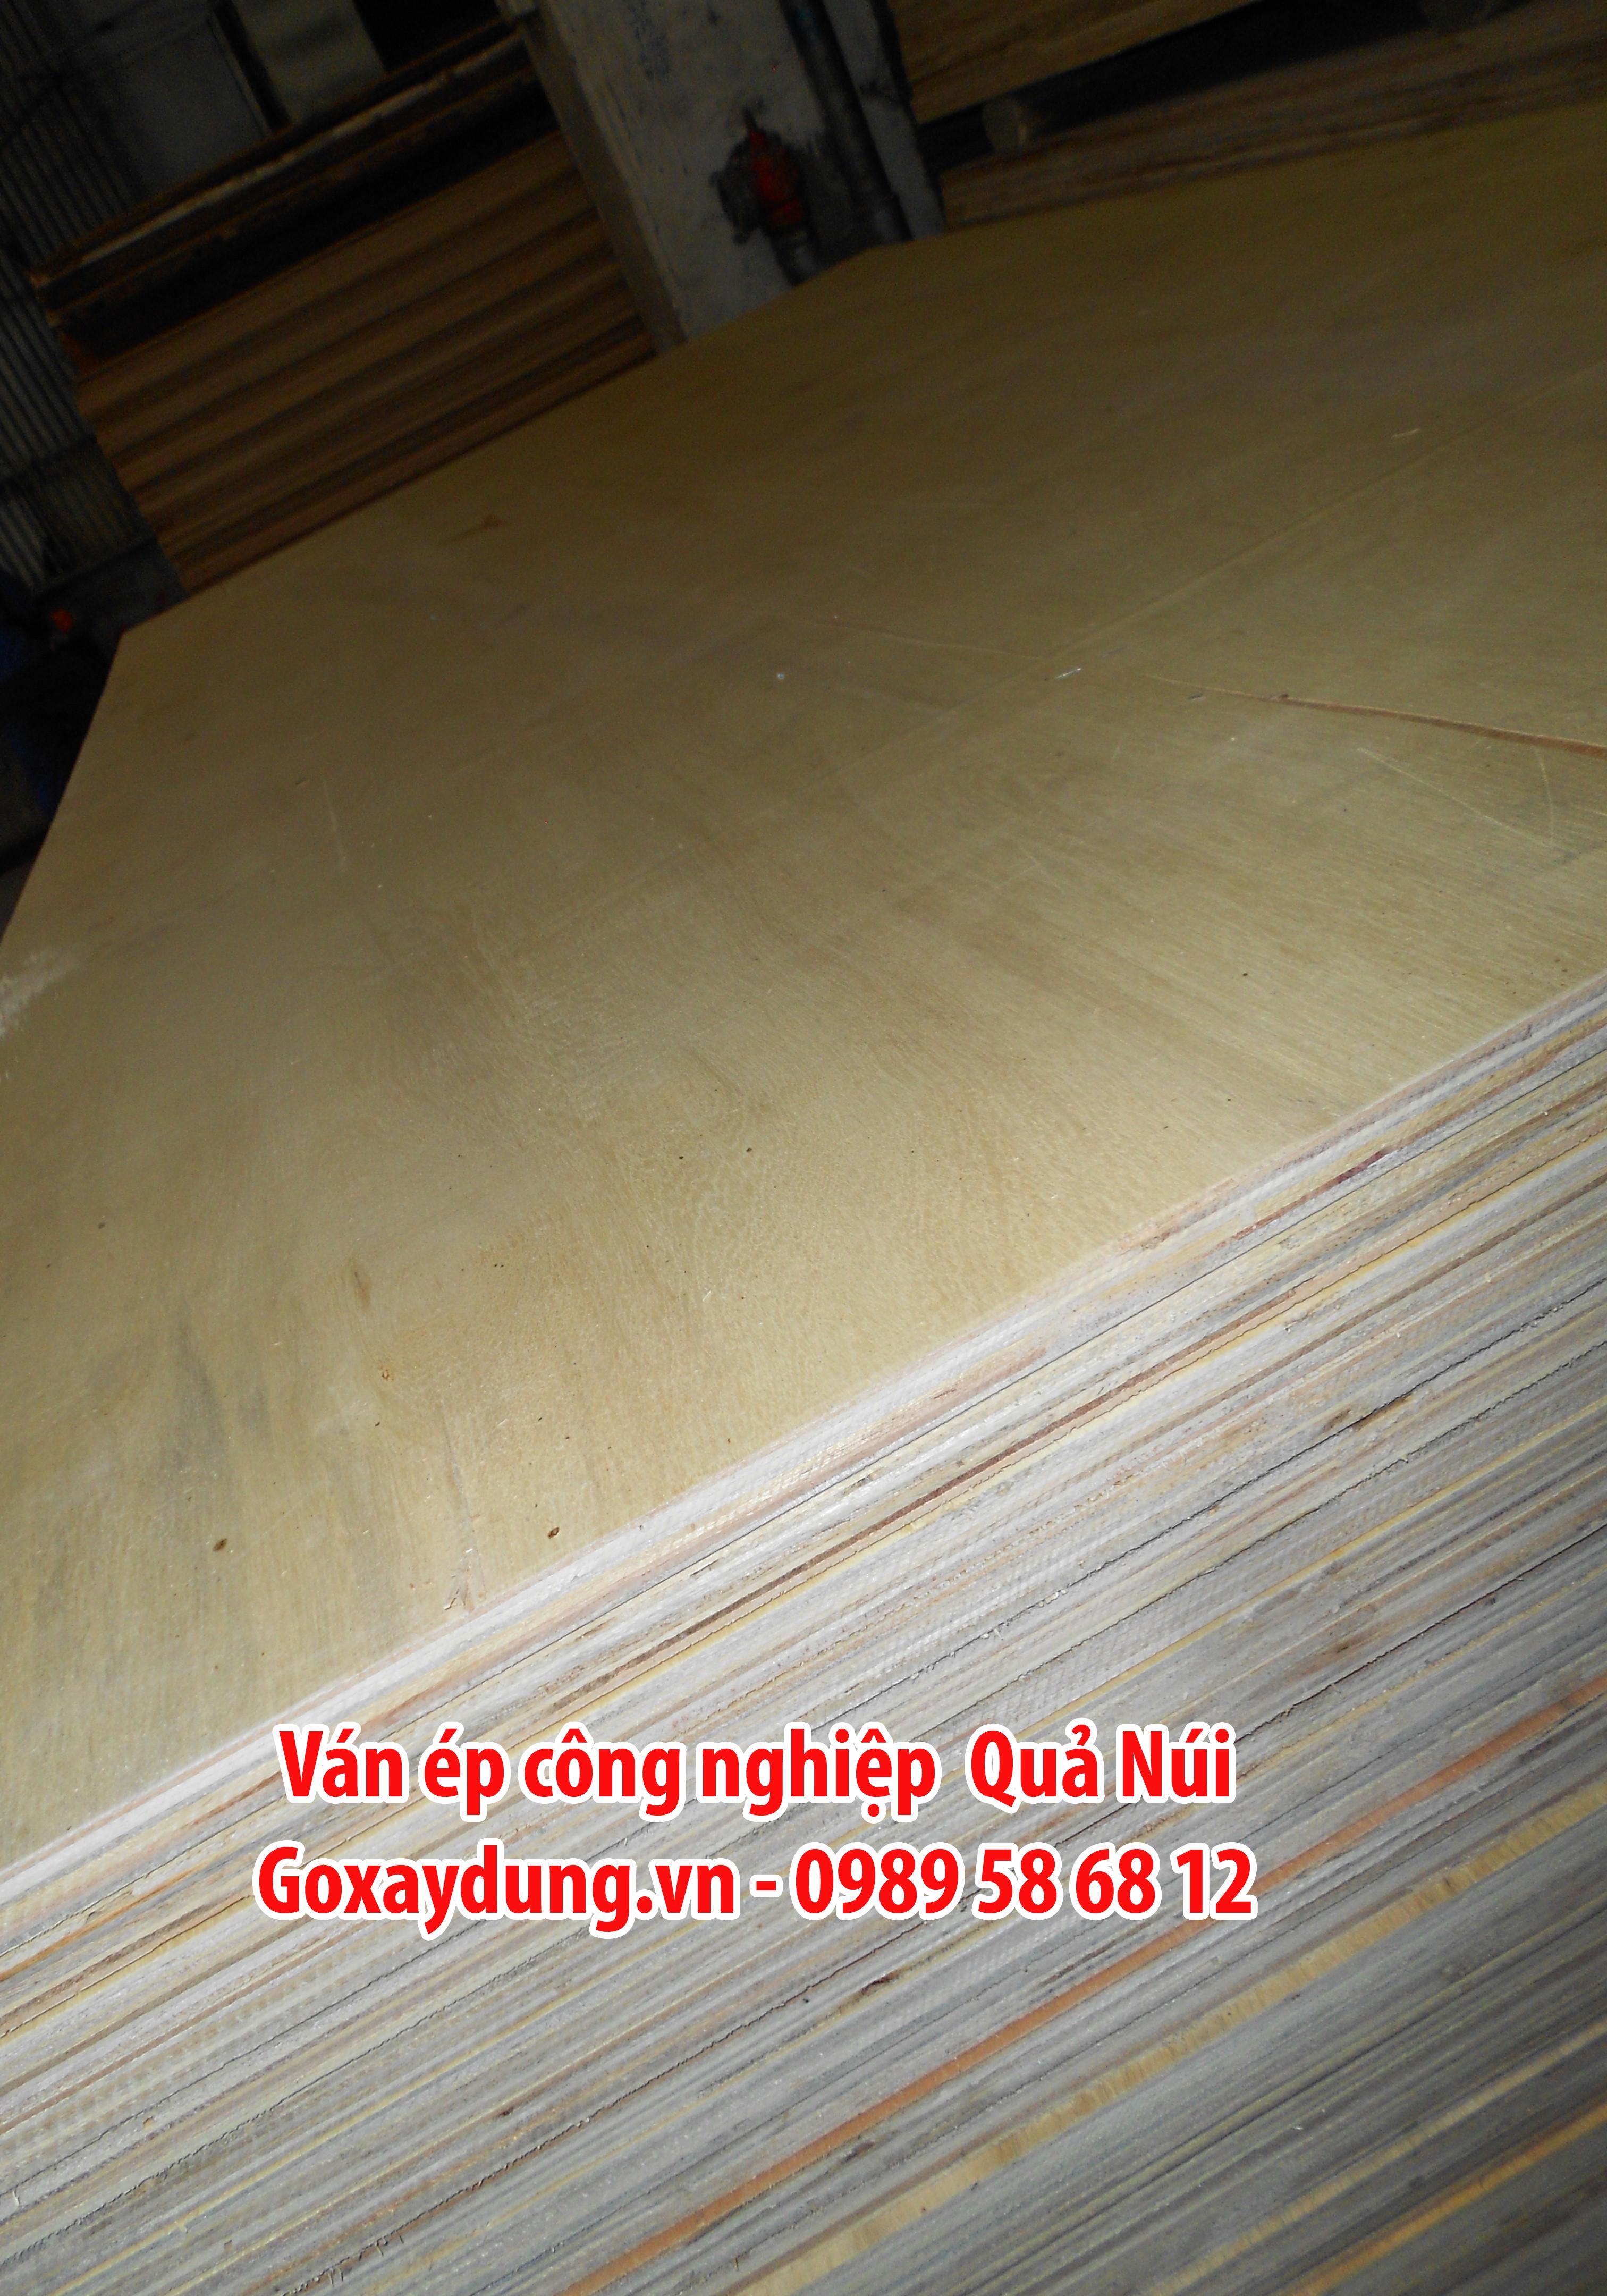 van-p-cong-nghiep-qua-nui-2-goxaydung.jpg